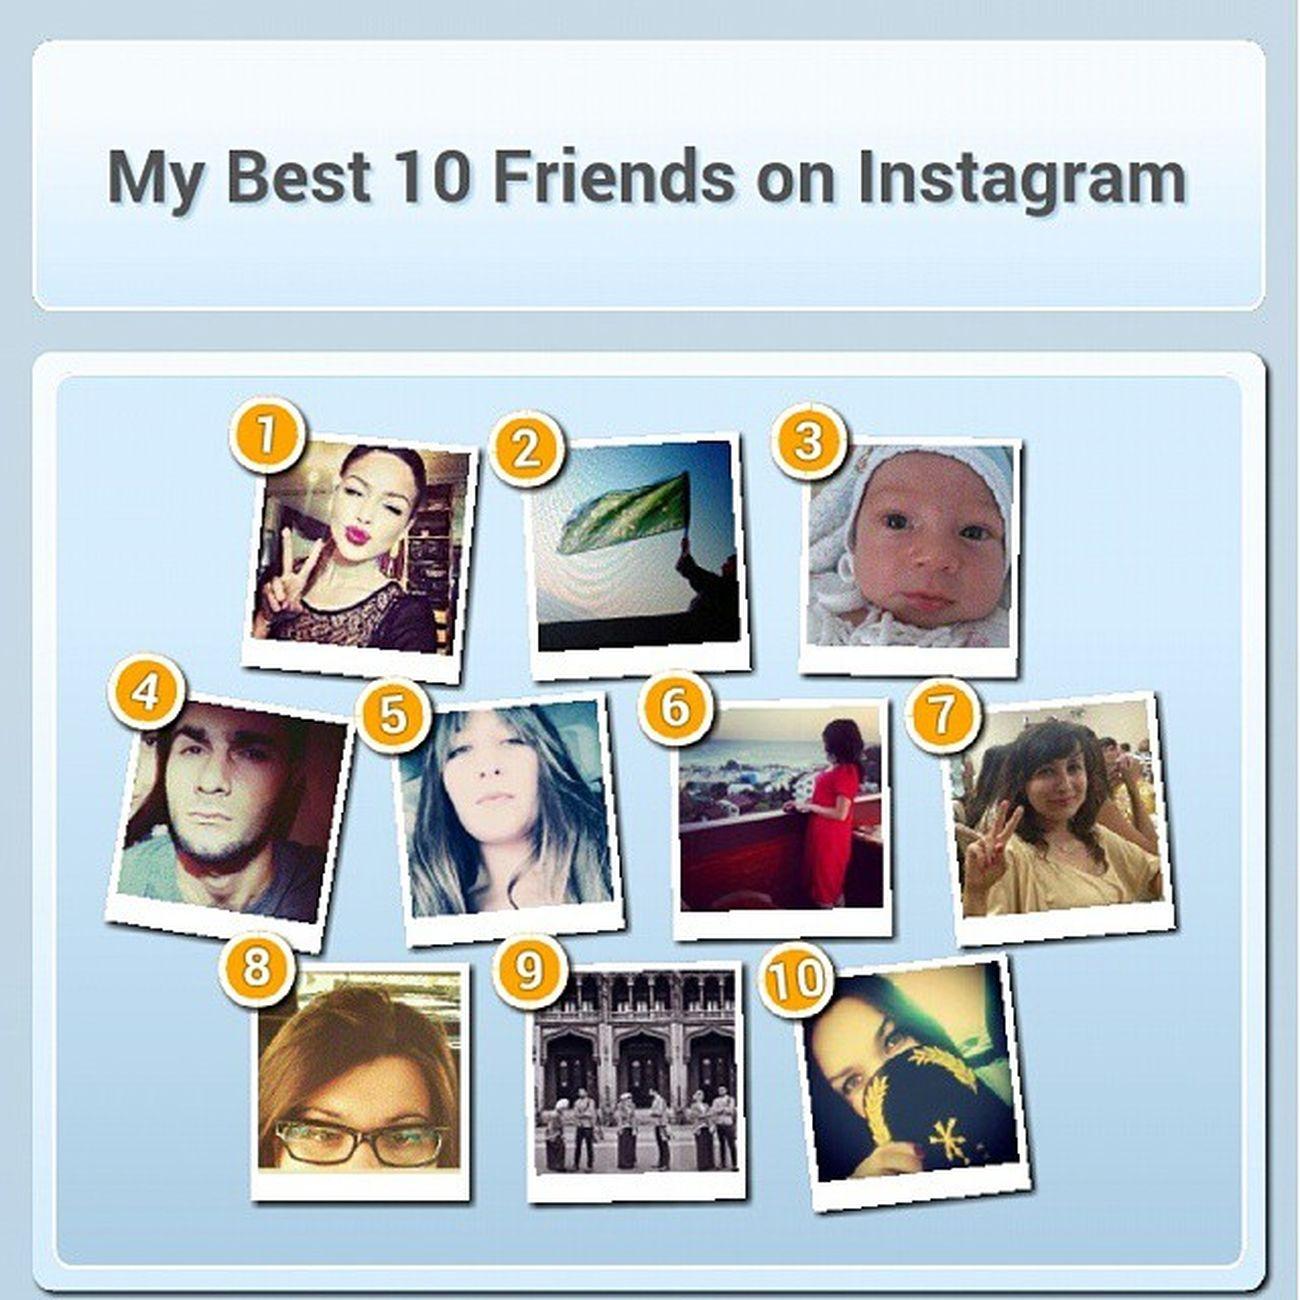 Конец очередной недели, а значит пора подводить итоги )))) ? 10лучших According to InstaBestFriends App, My Best 10 Friends on Instagram are 1 @bellali_001, 2 @dianaurumova, 3 @maz_bella, 4 @chetyz01, ? 5 @zulifa01, 6 @shavtikovamadina, 7 @leila_ham, 8 @mnafam, 9 @belunya_ and 10 @ruuuuuslanovnaaaa ? Mybestfriends Bestfriends bestfriendsforever bff